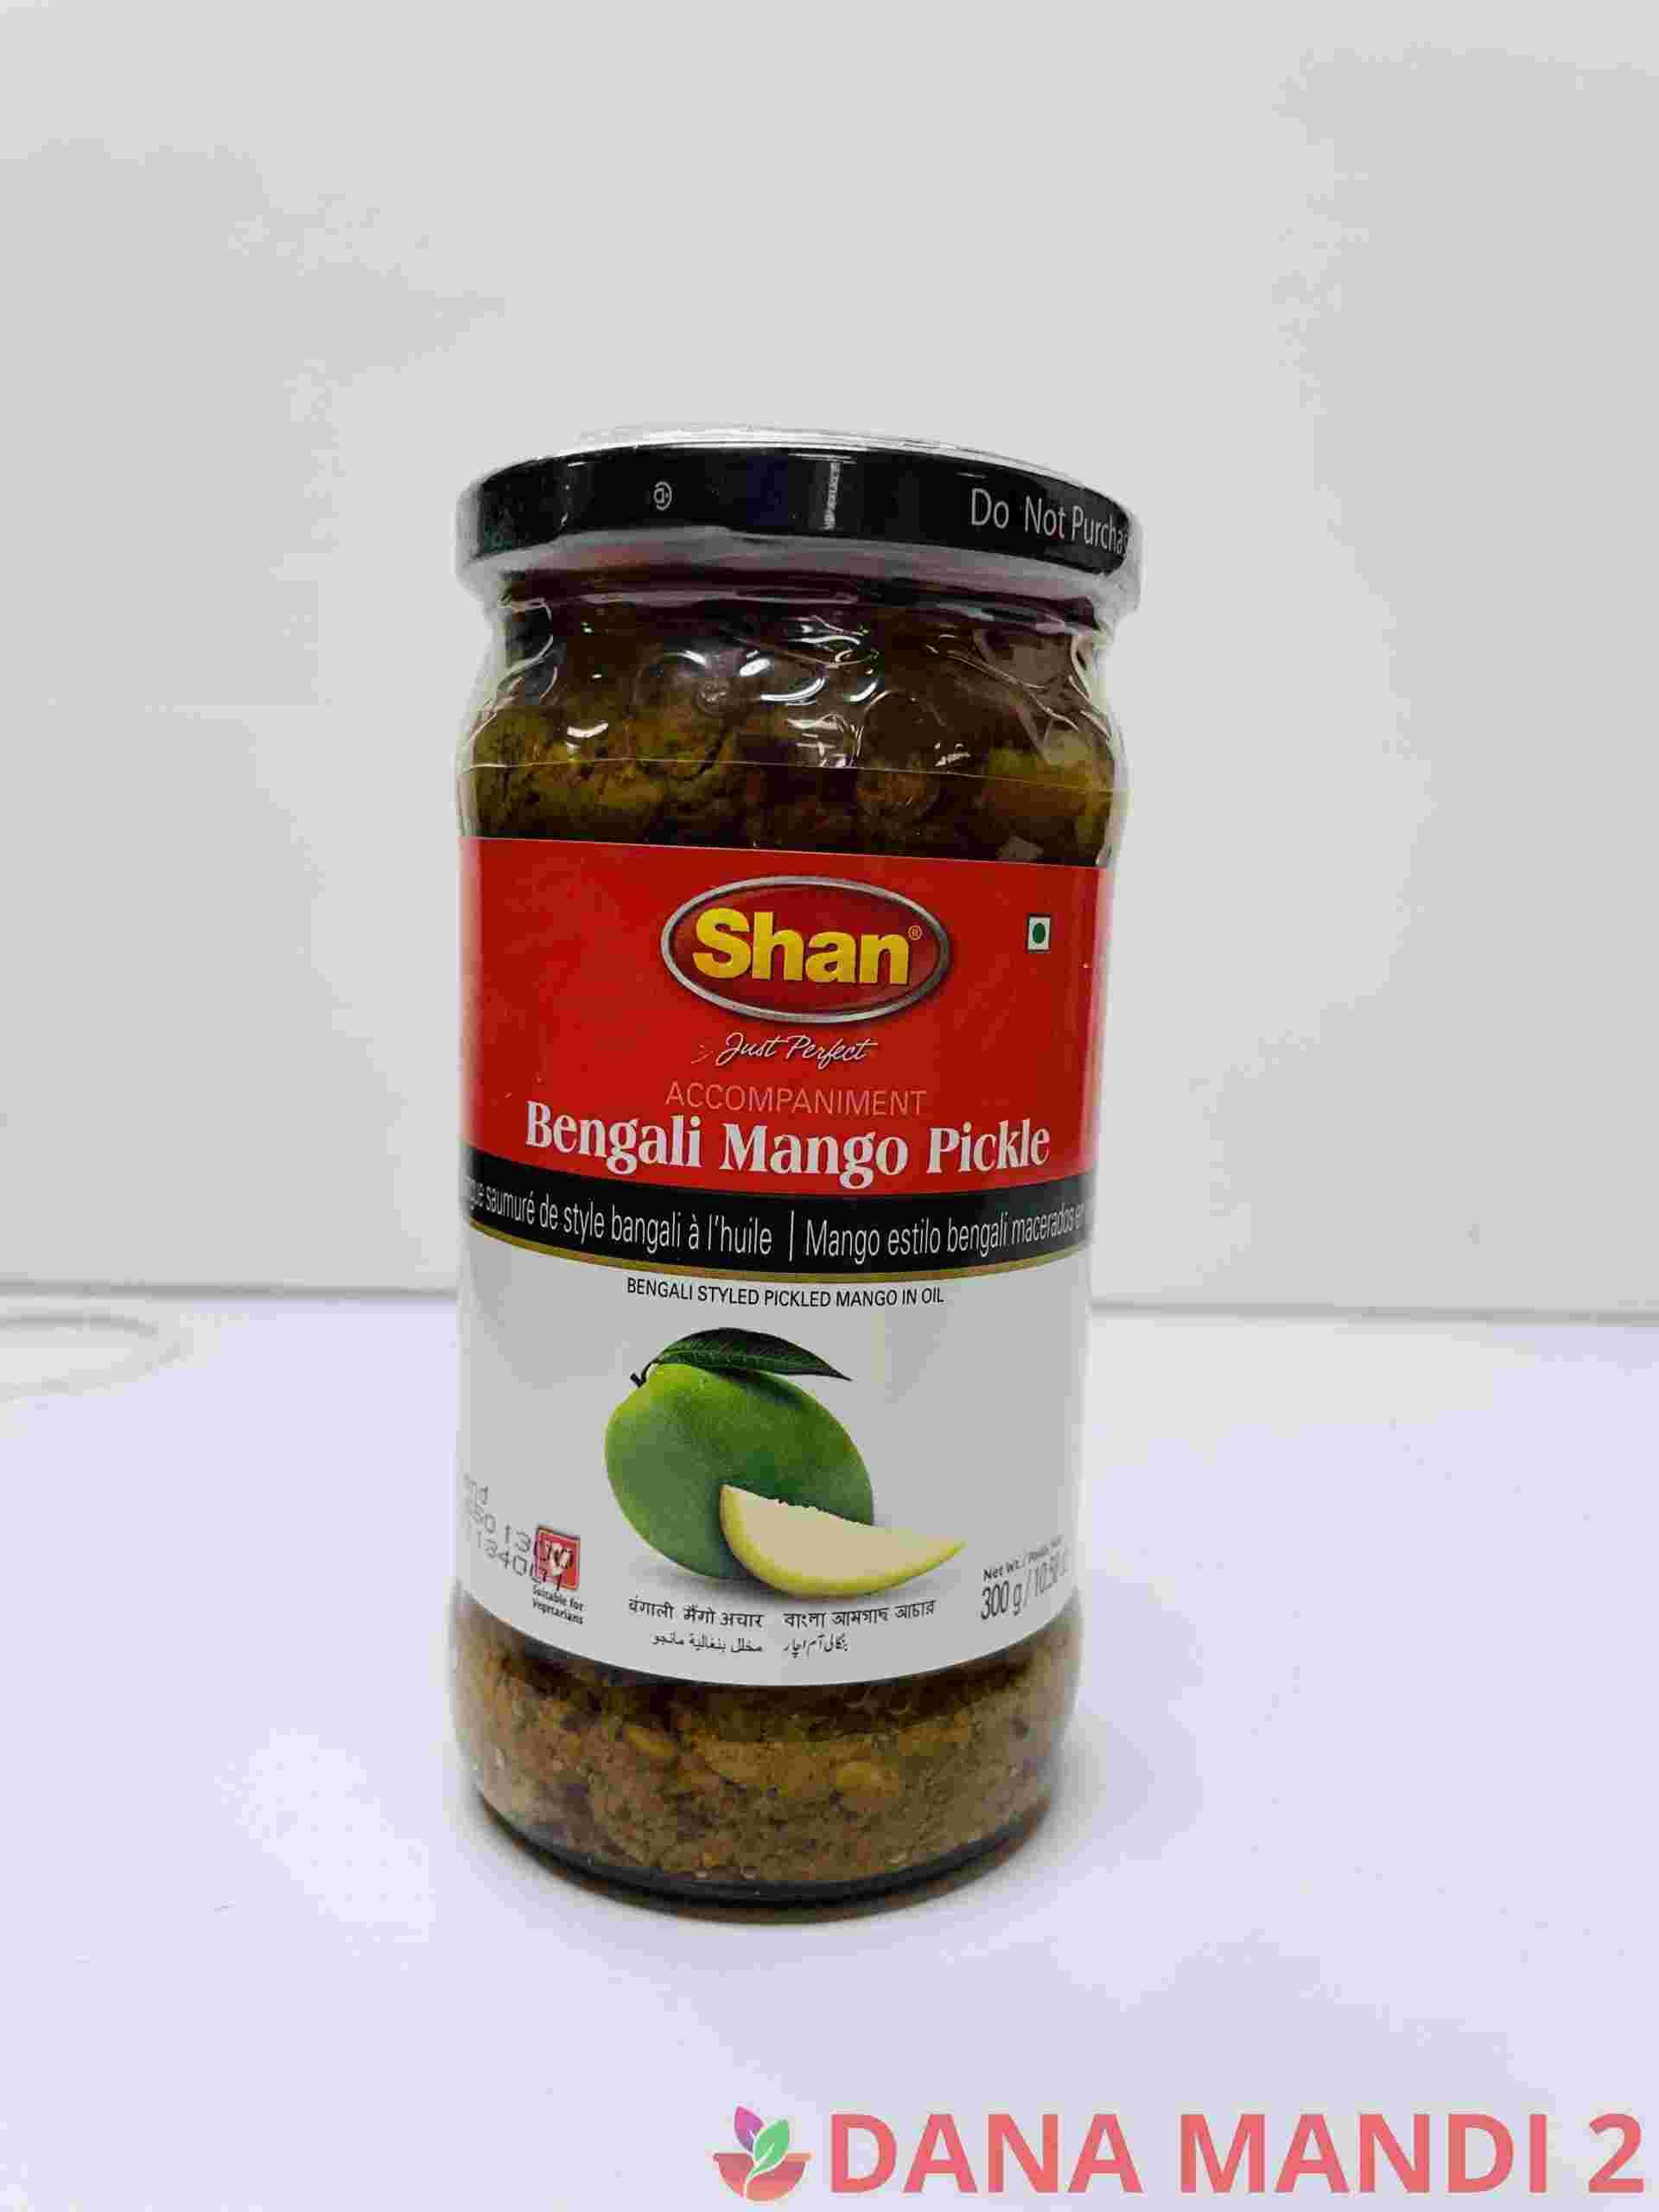 Shan Shan Bengali Mango Pickle